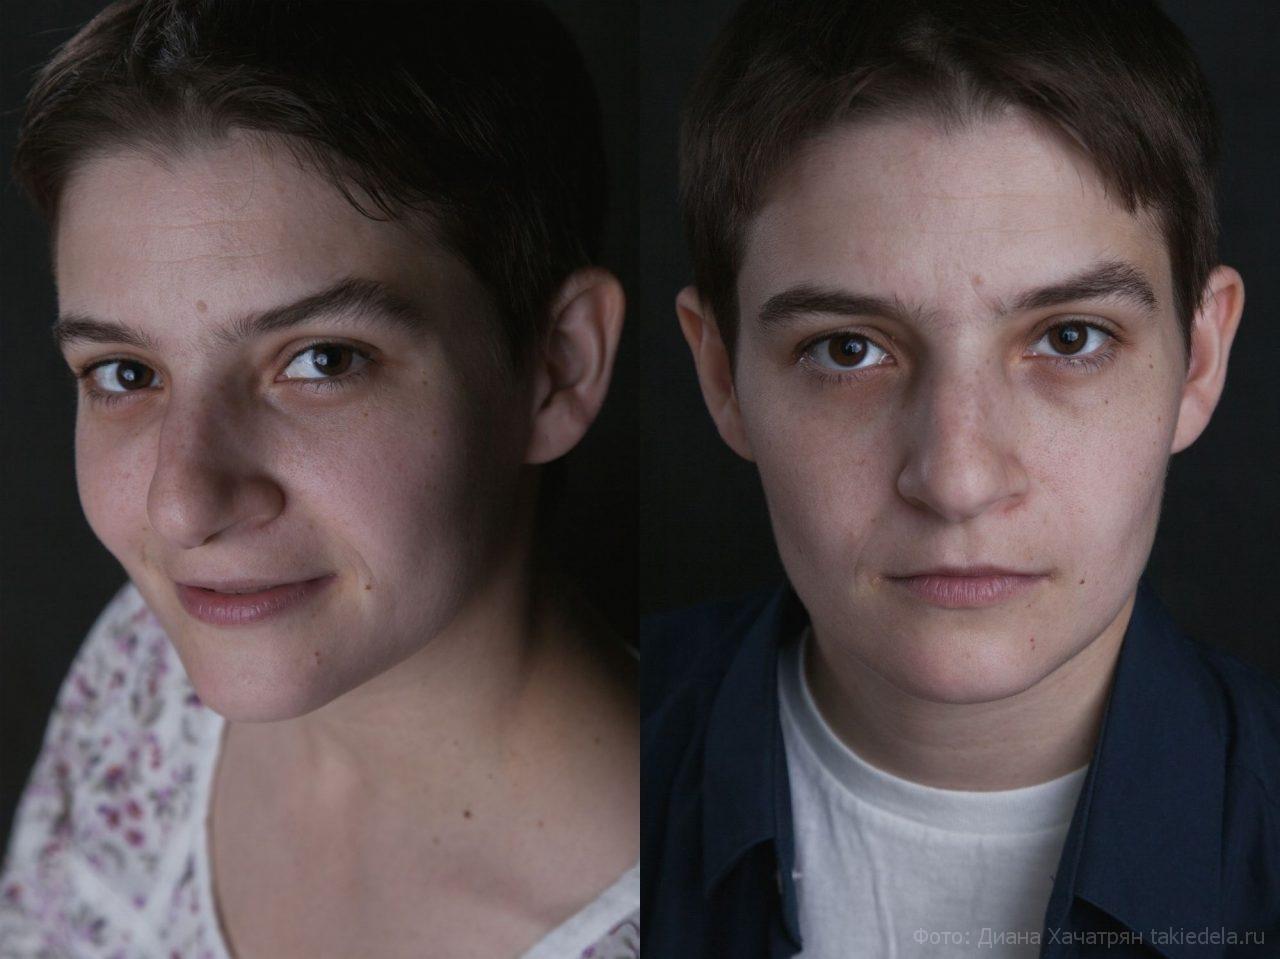 Два трансвестита набросились на парня